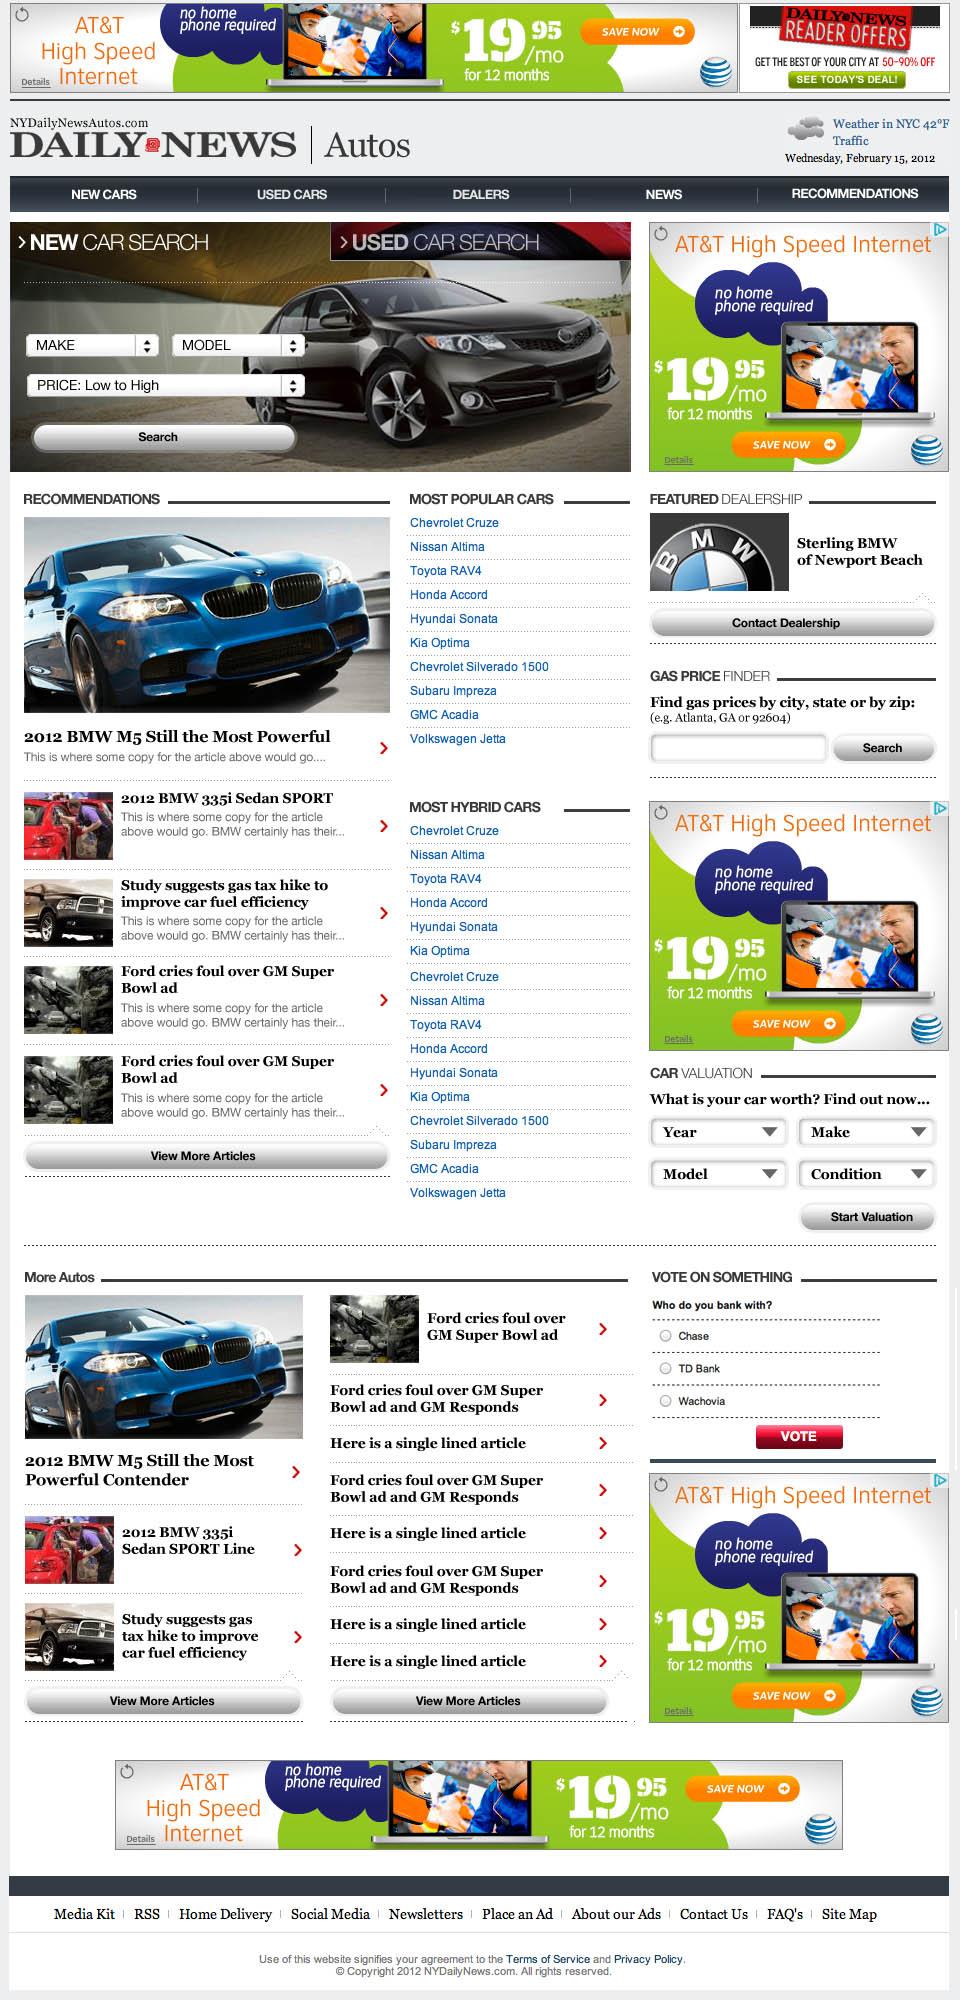 NYDN Autos - Desktop Home